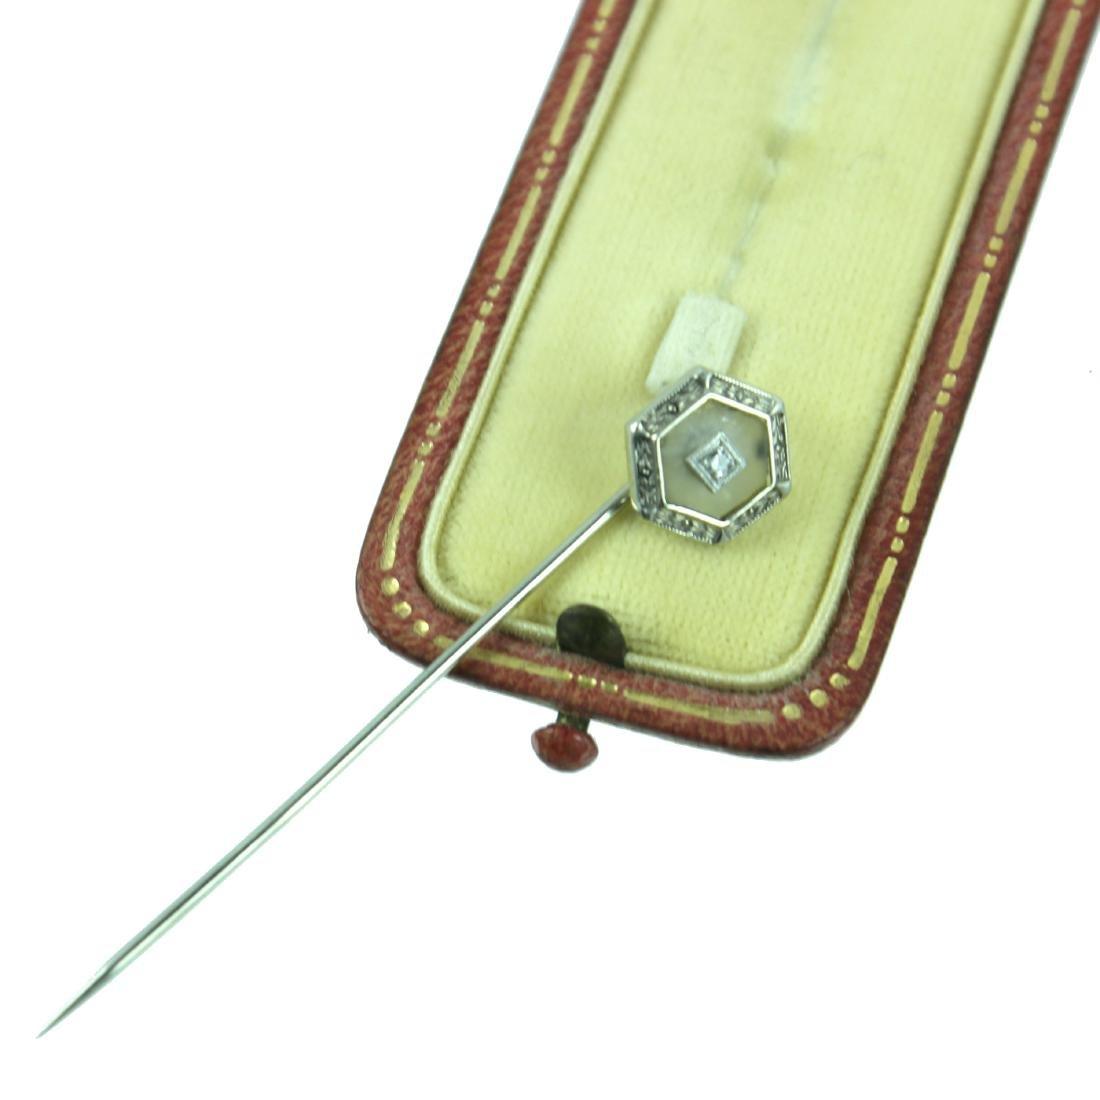 14 KARAT DIAMOND TIE PIN